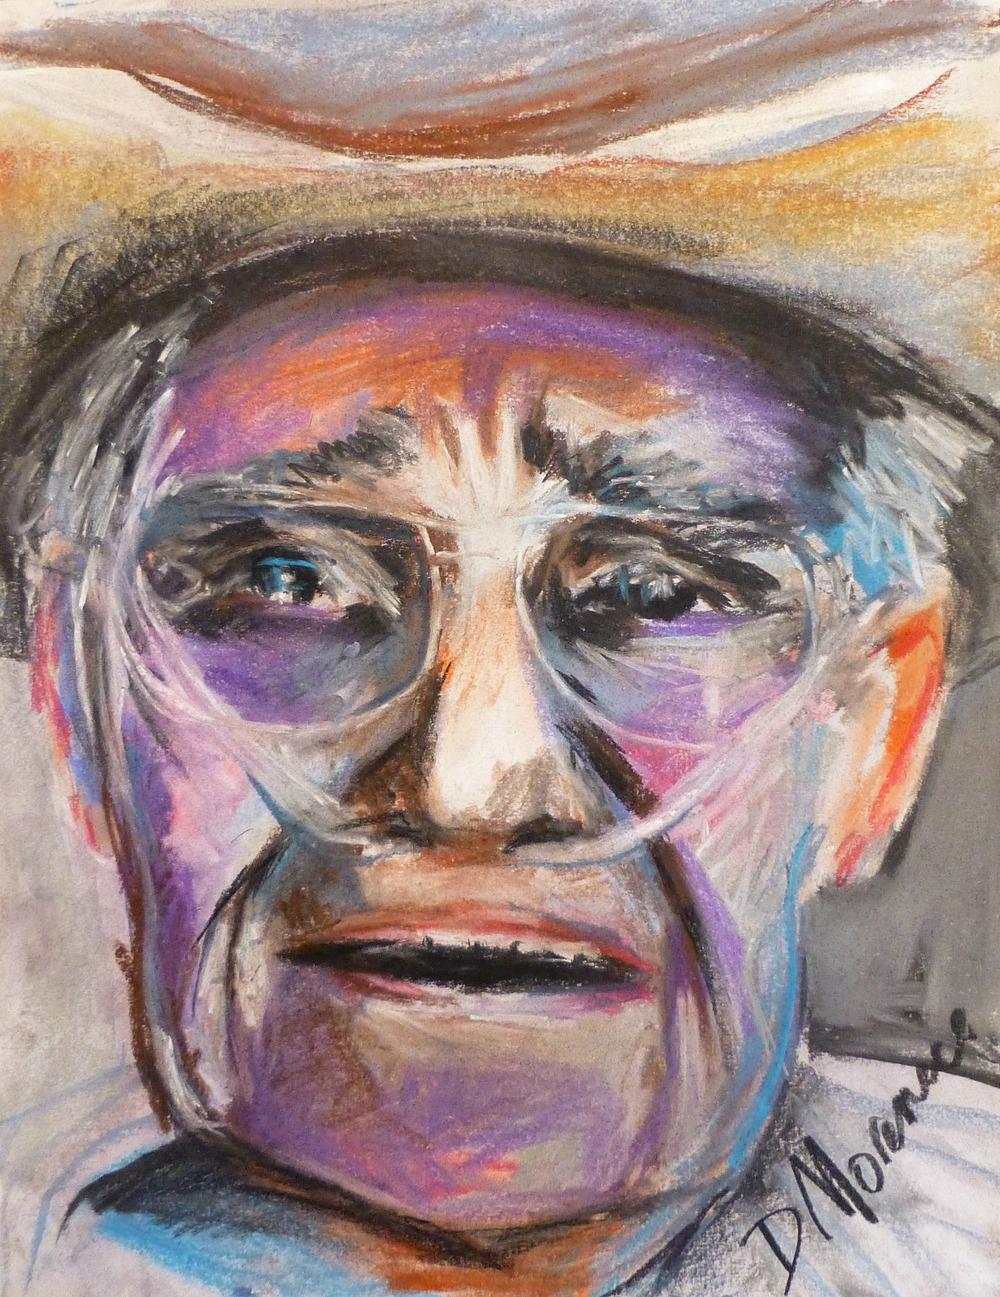 nwm - Sketch - Old Cali Cowboy.jpg